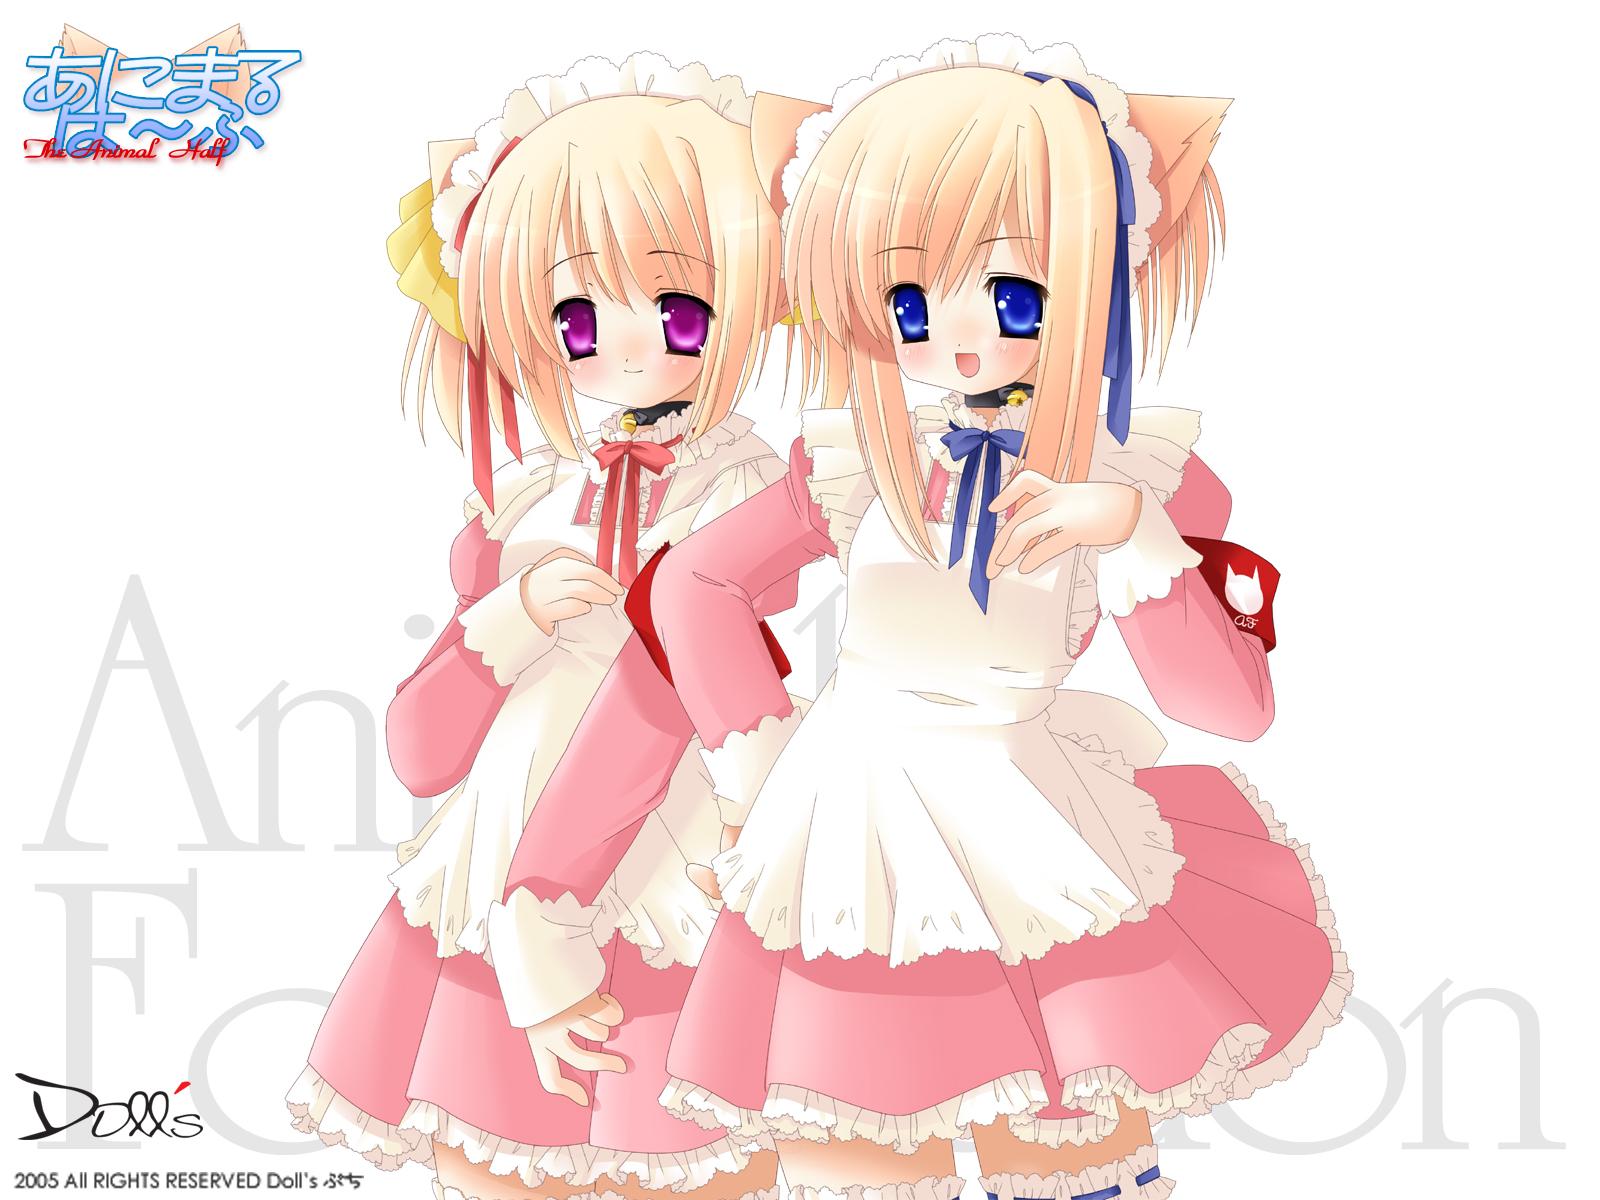 animal_ears bell blue_eyes catgirl collar headdress maid pink_eyes ribbons thighhighs white